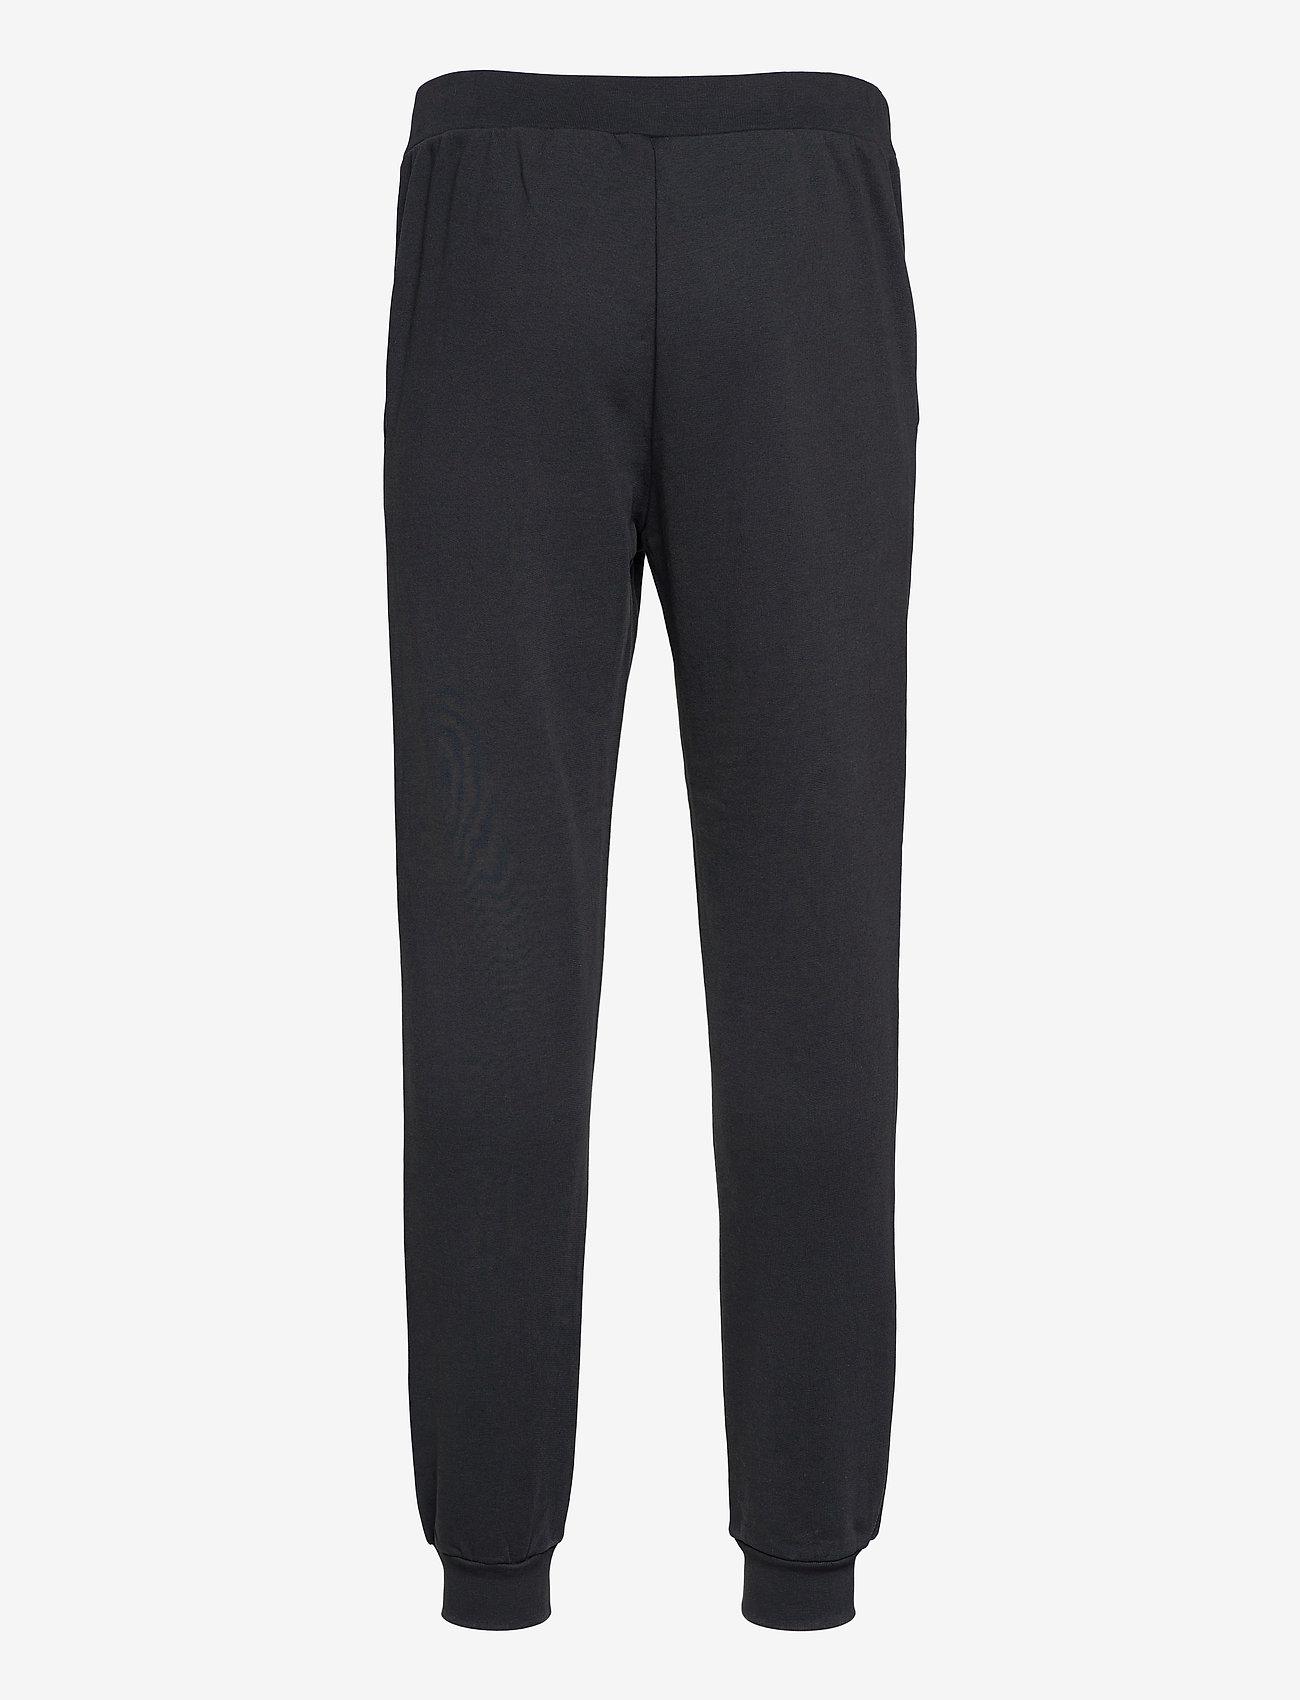 Knowledge Cotton Apparel - TEAK sweat pants - GOTS/Vegan - kleding - phantom - 1